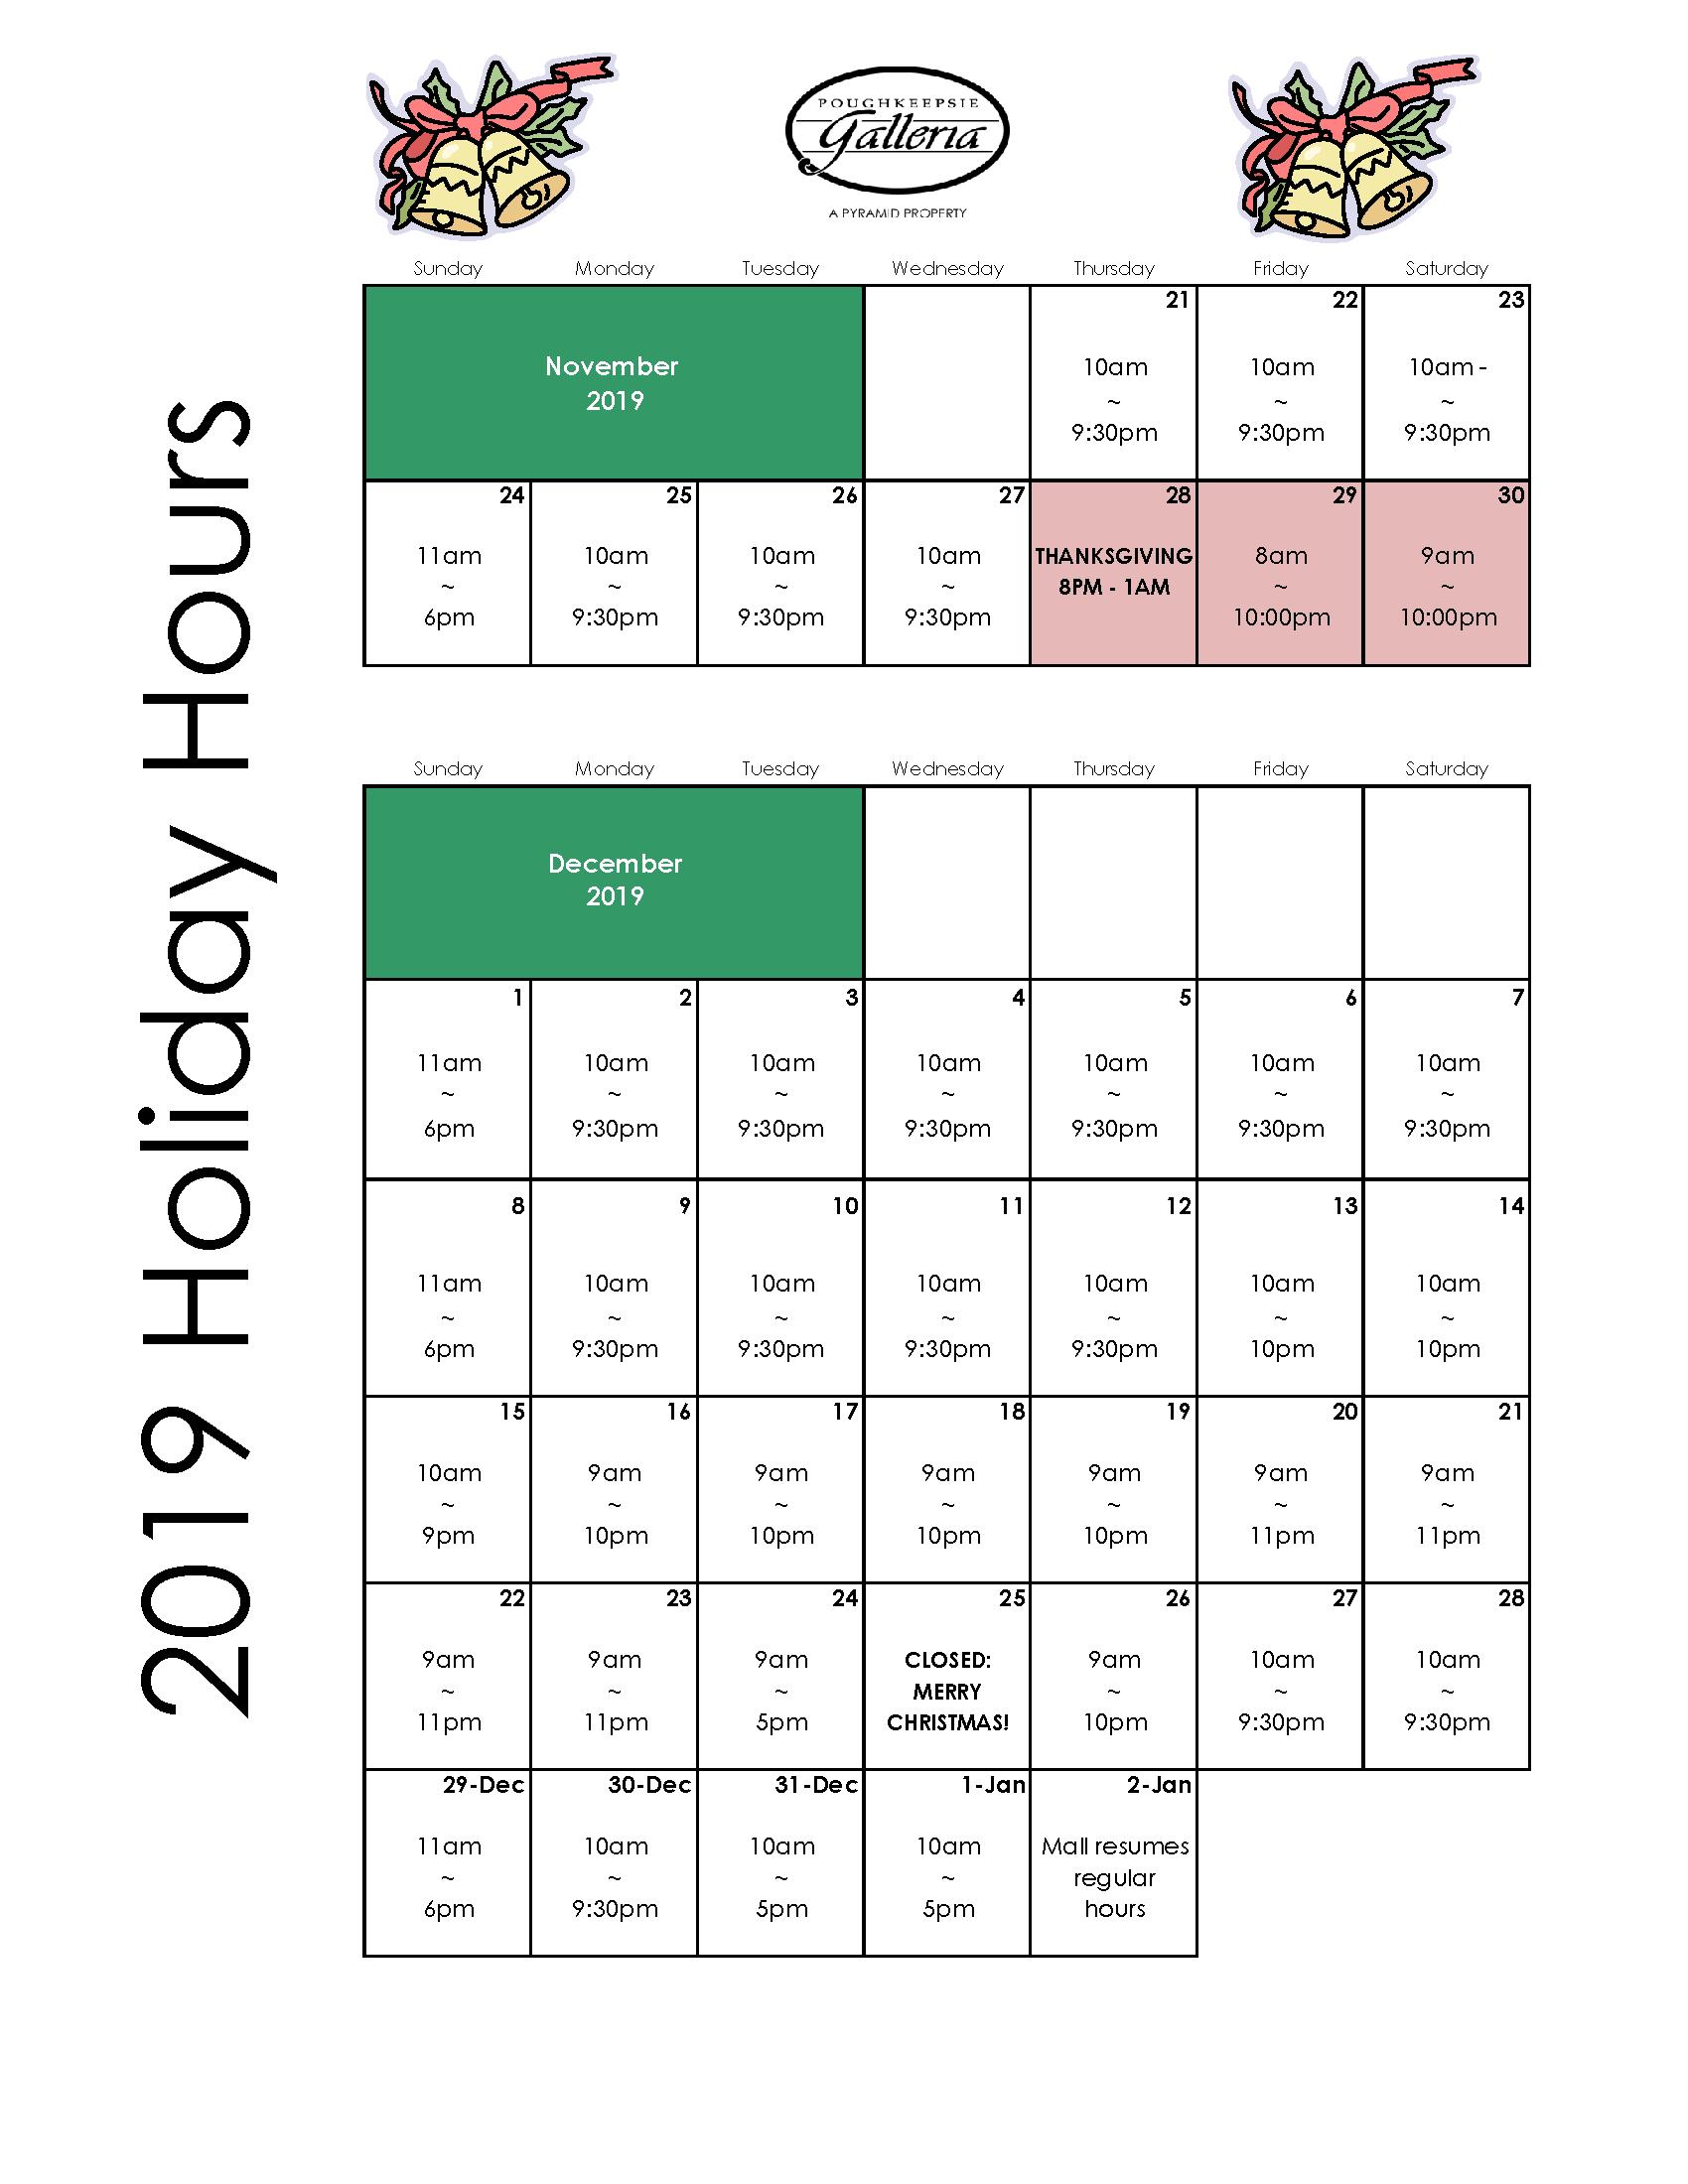 Poughkeepsie Galleria Holiday Hours 2019